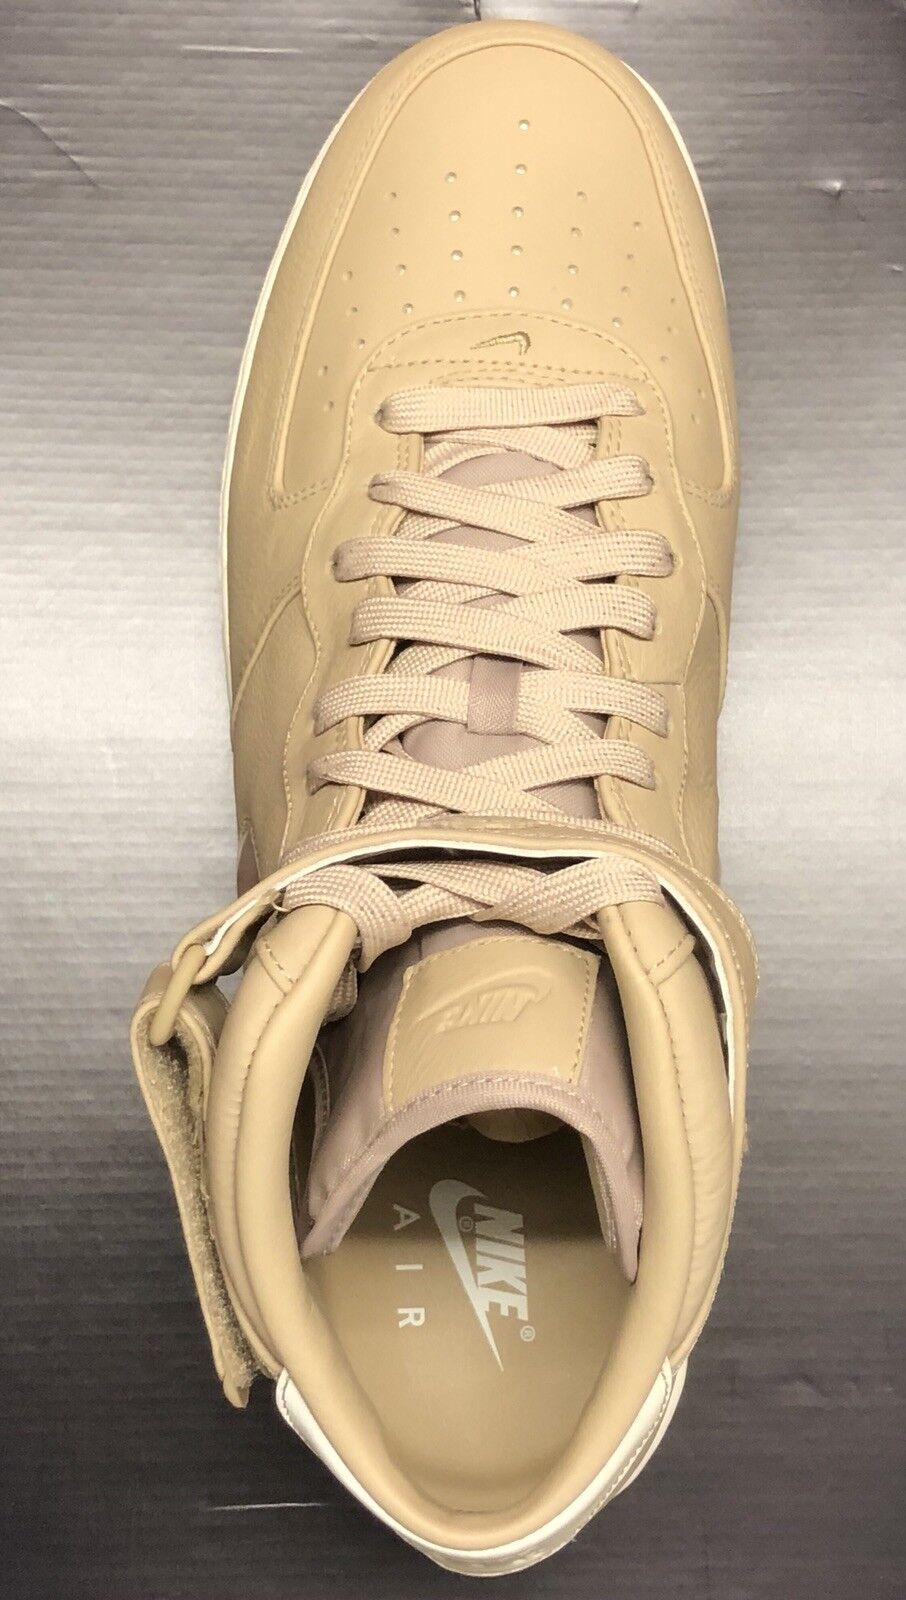 Nike air force 1 prm mitte retro - prm 1 juwel mens turnschuhe schuhe us - 13. 595e44